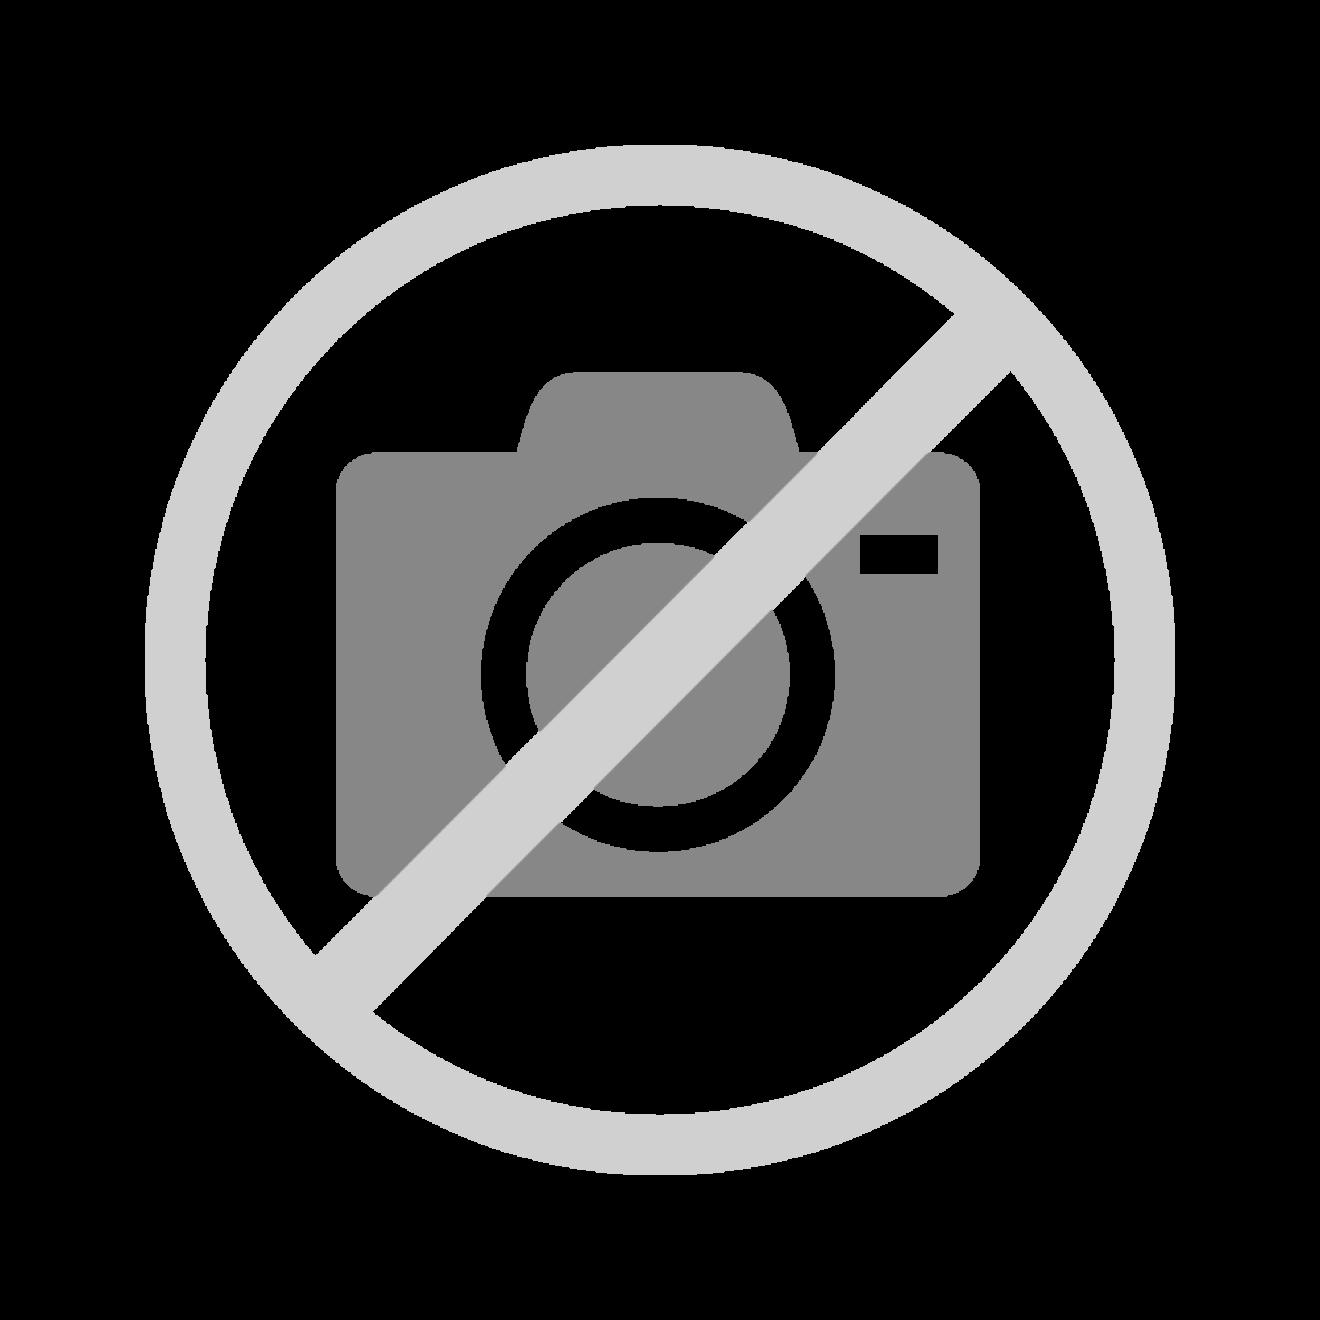 transportgamaschen lila 4er set f r minishetty beinschutz. Black Bedroom Furniture Sets. Home Design Ideas